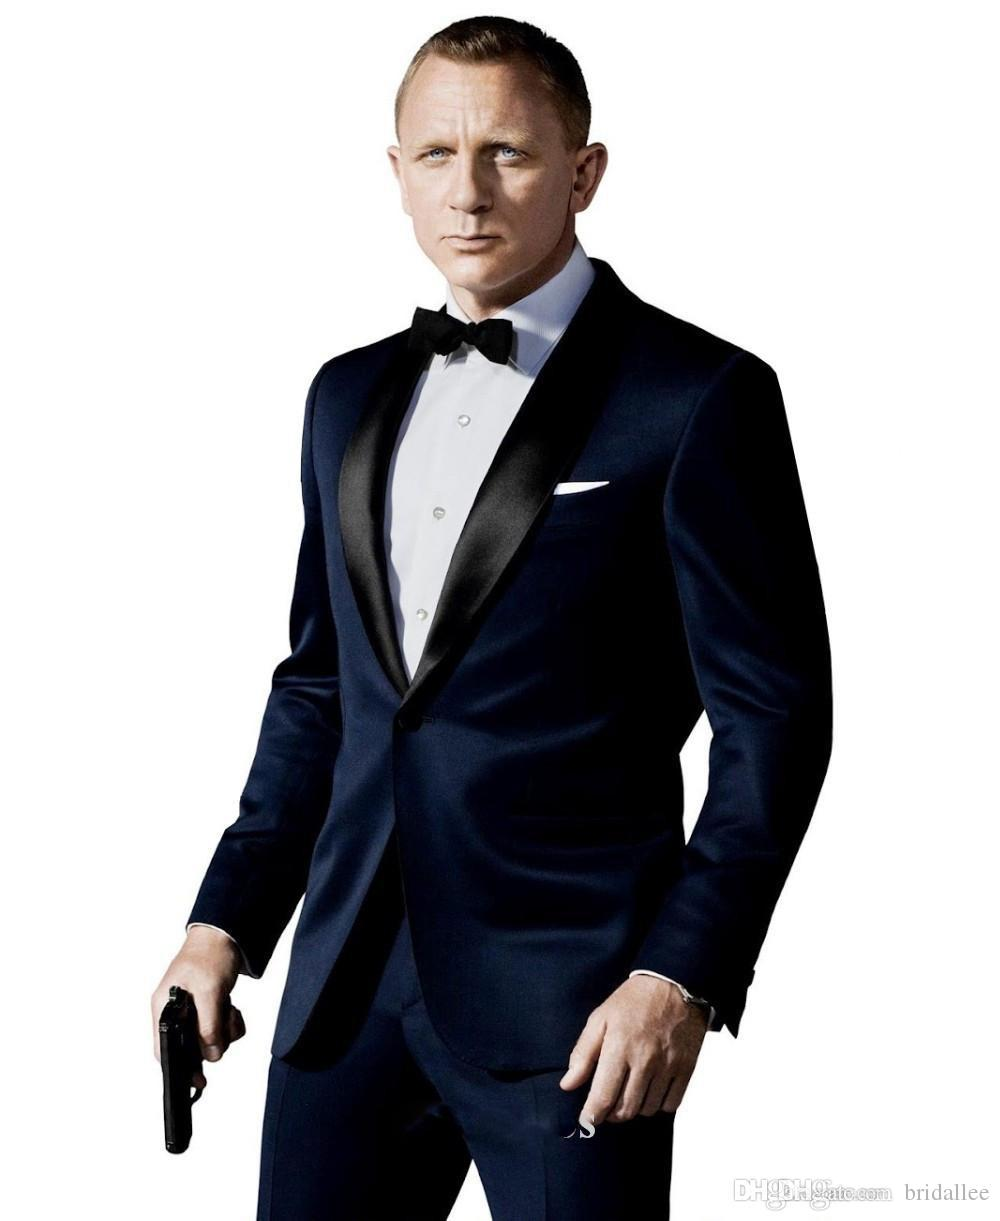 007 James Bond Dark Blue Groom Tuxedos Jacket Pant Tie Mens Fashion Tux Tuxedos Boyfriend Blazer Bridegroom Mens Clothing Speech Canada 2019 From